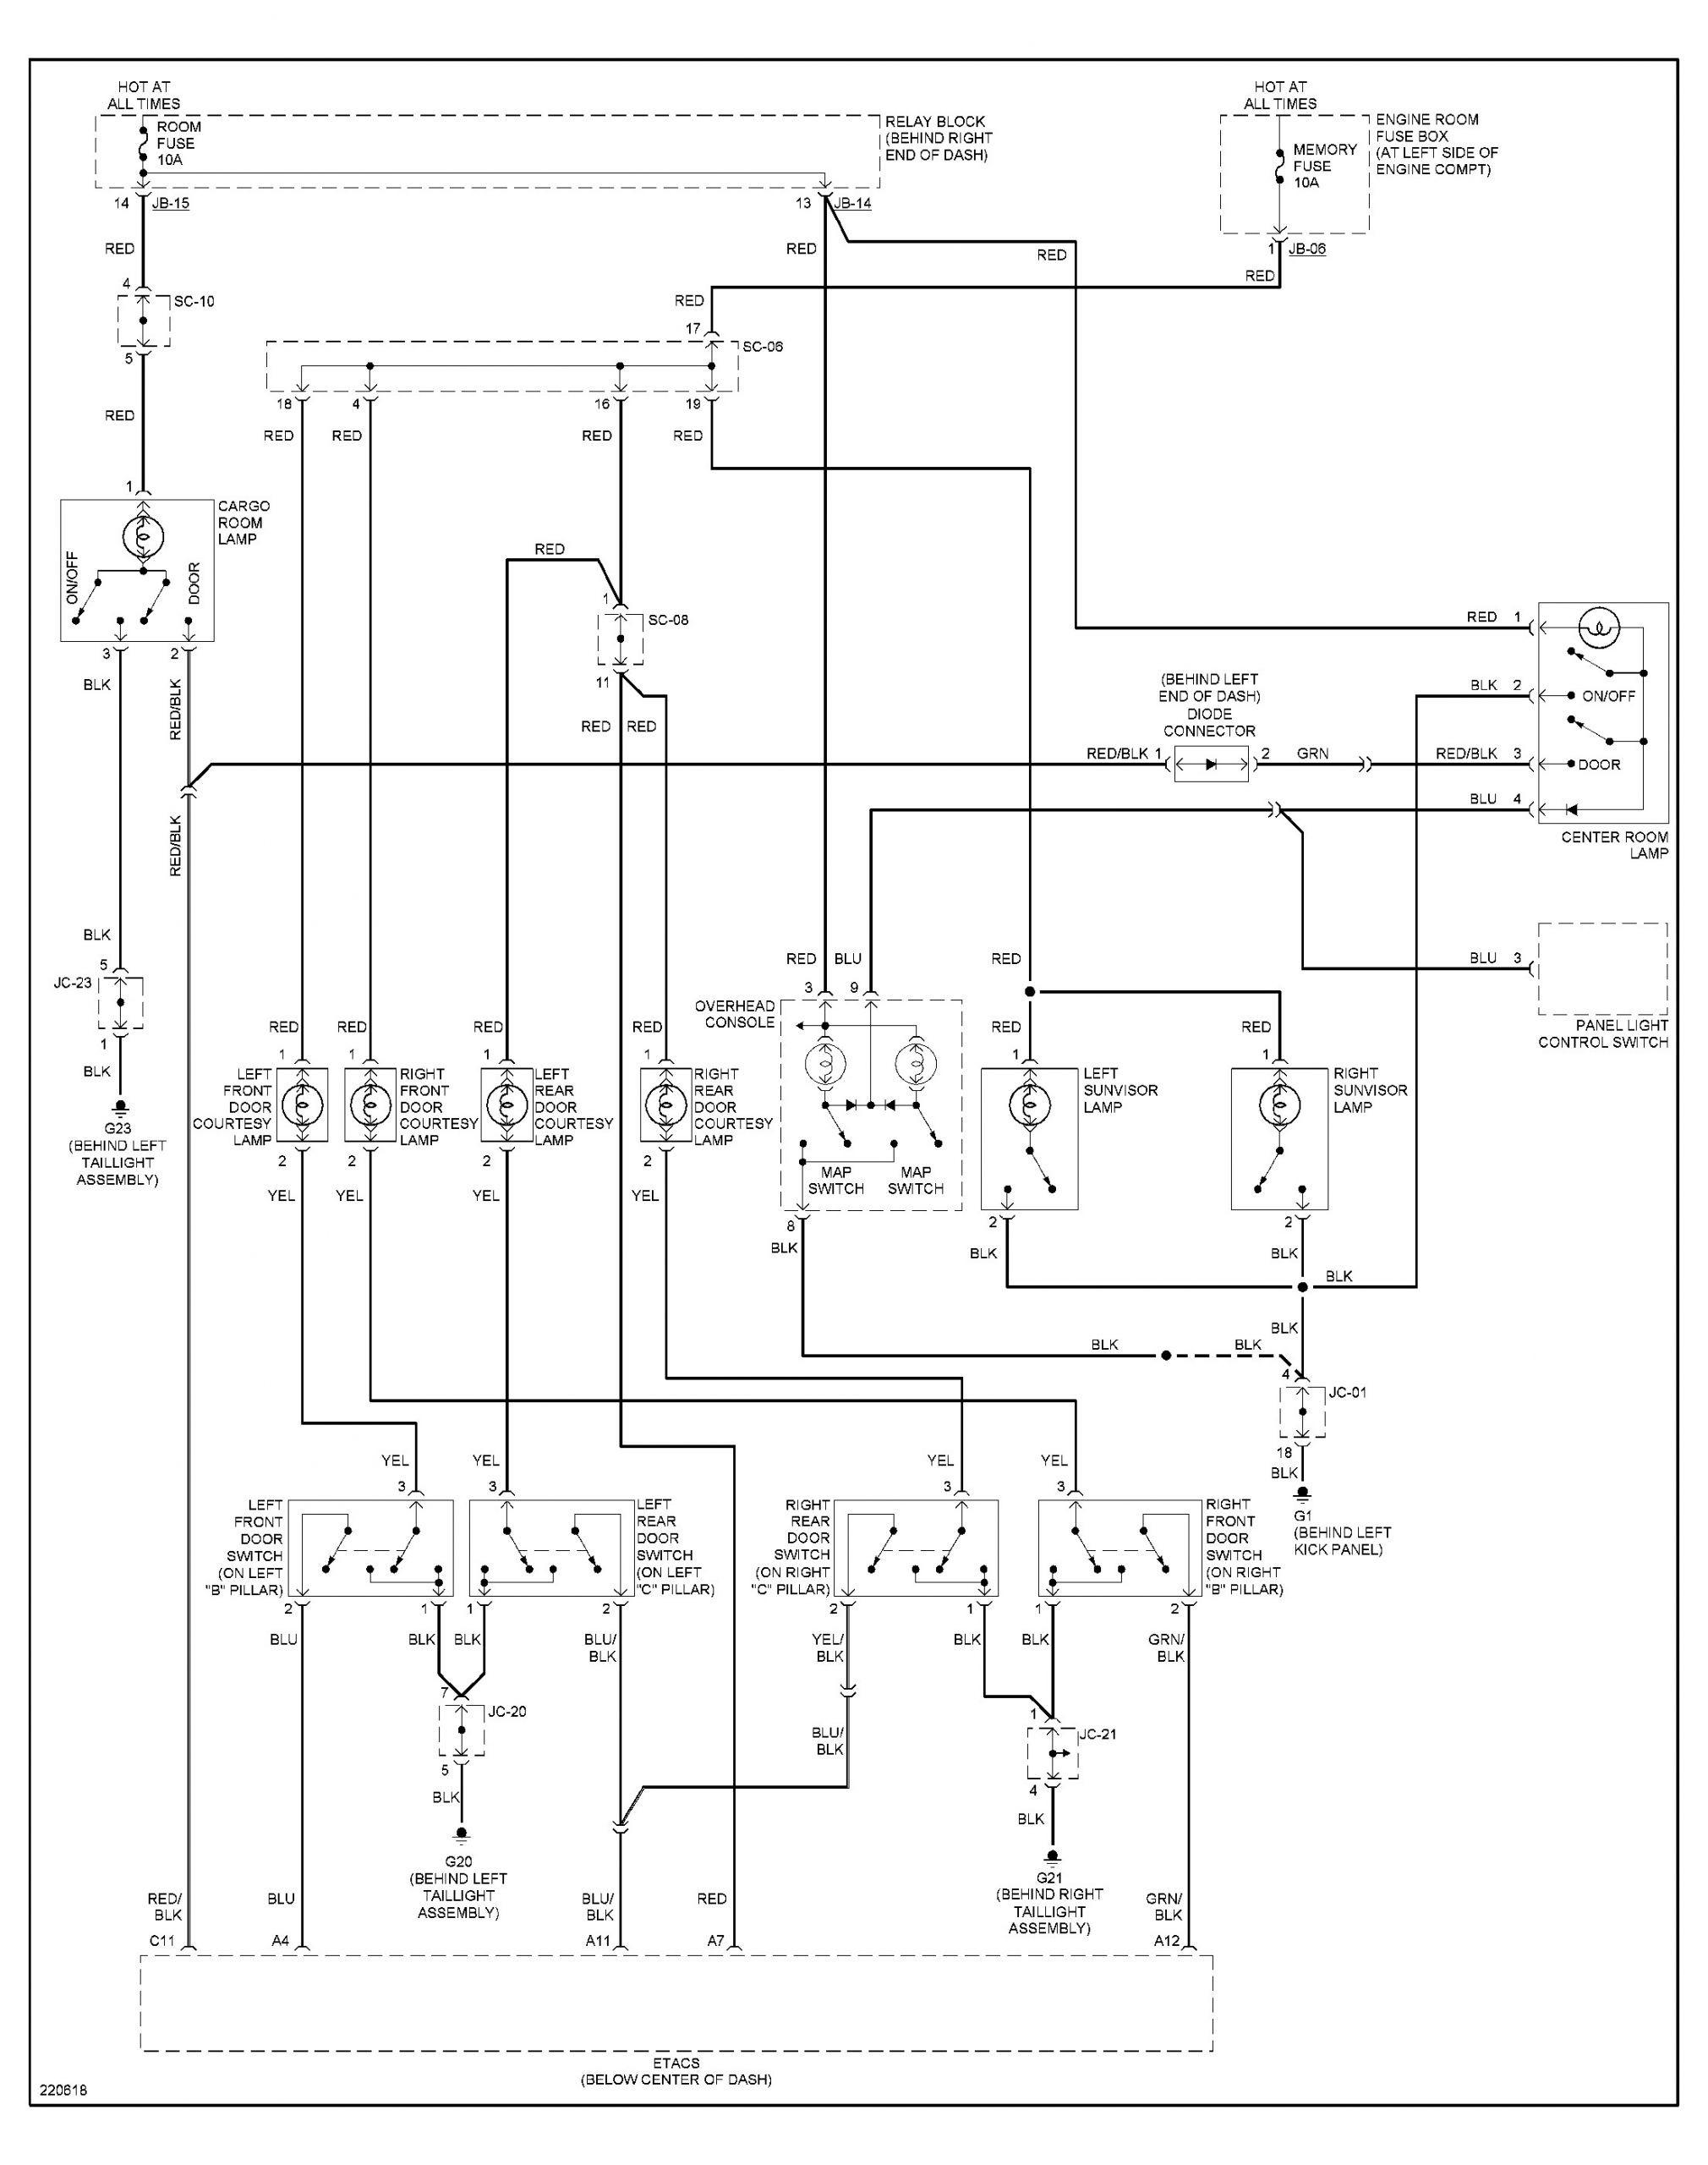 Cooling Fan Wiring Diagram 2002 Jeep Liberty 2006 Kia Spectra Heater Wiring Diagram Wiring Diagram Of Cooling Fan Wiring Diagram 2002 Jeep Liberty